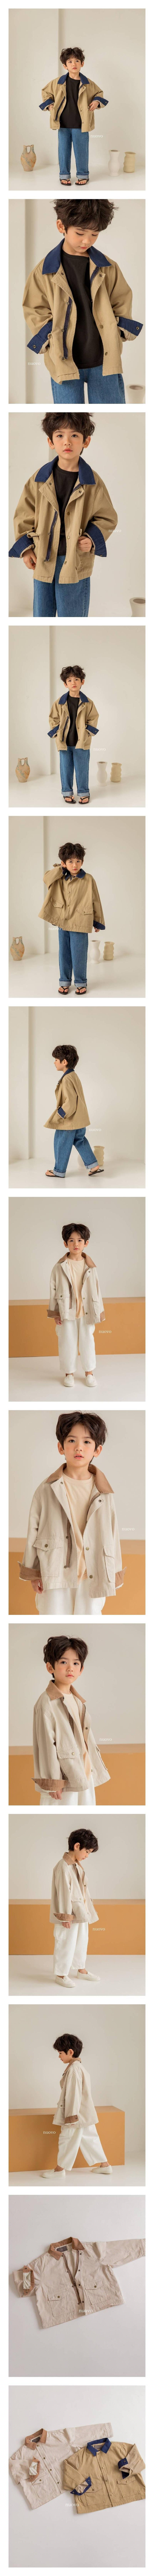 NUOVO - Korean Children Fashion - #Kfashion4kids - Bonnet Jacket